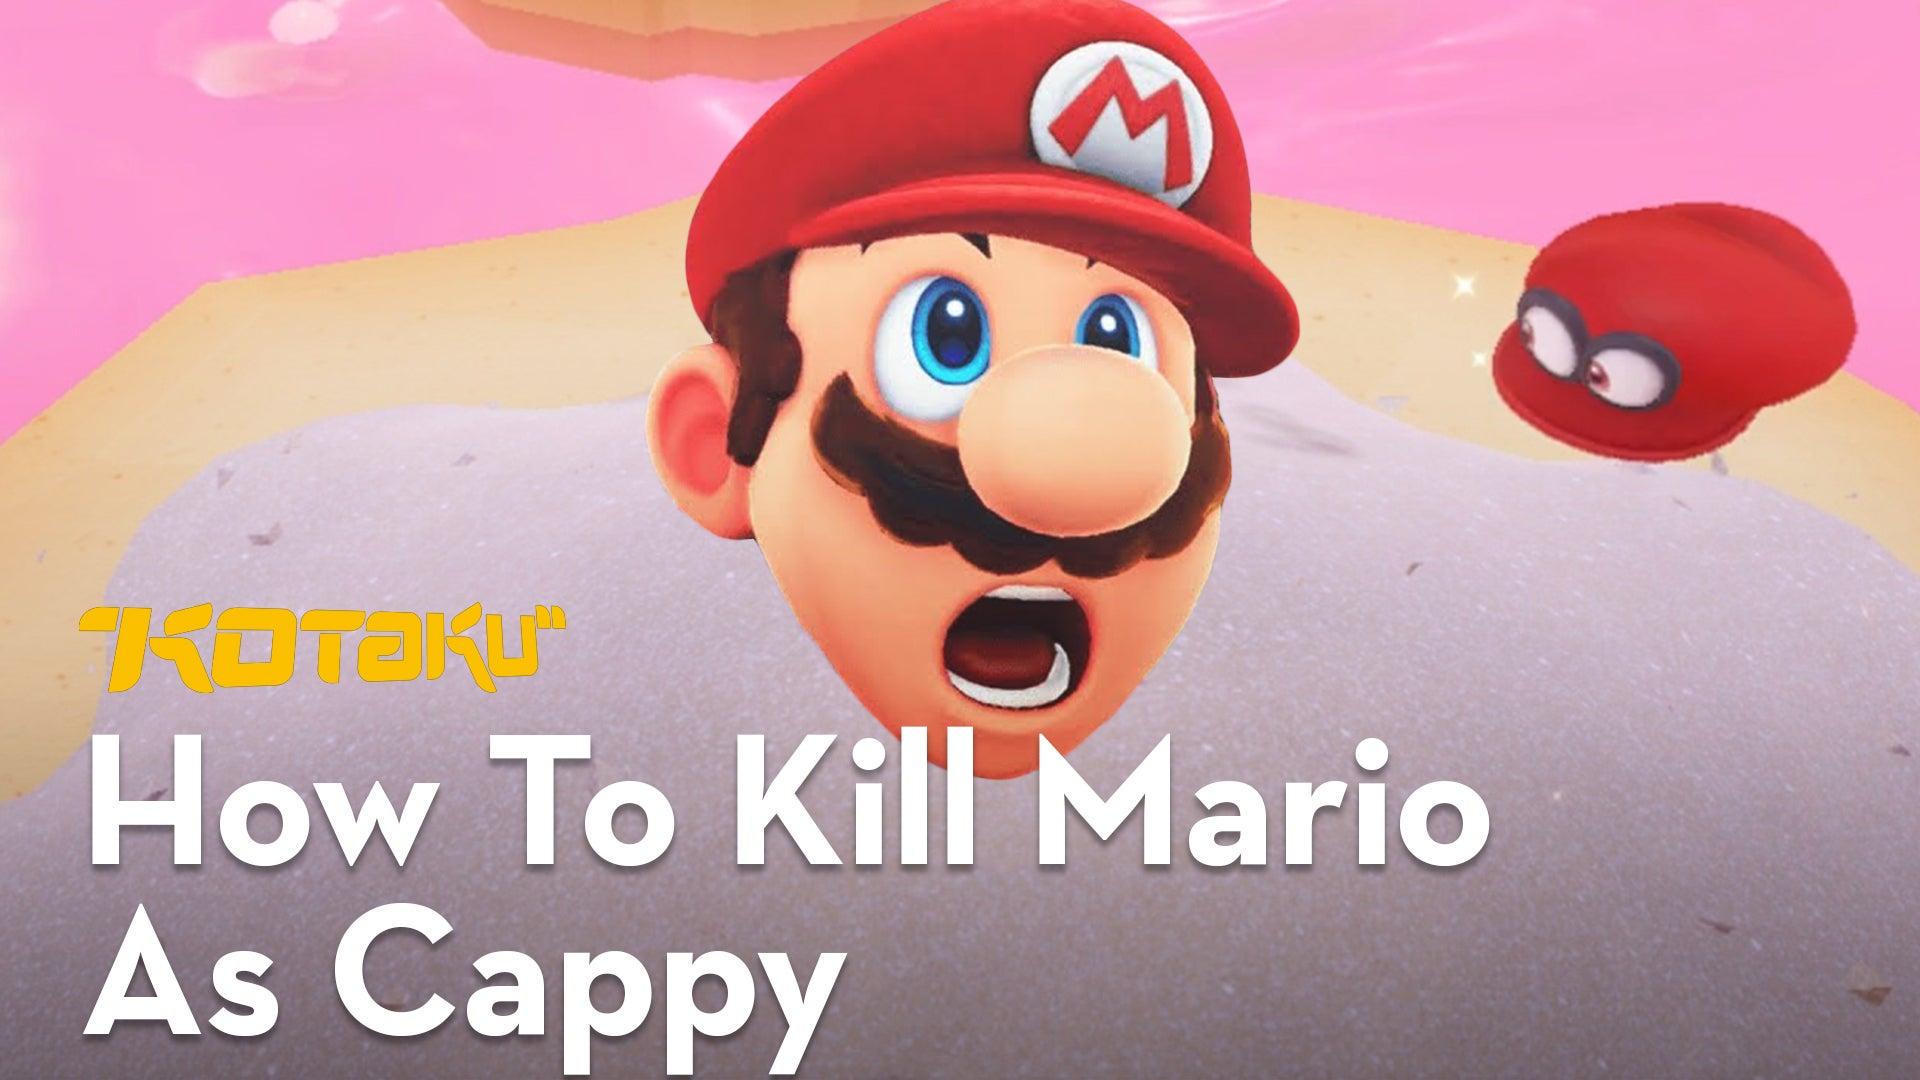 Nintendo nearing deal with Minions studio to make Super Mario movie